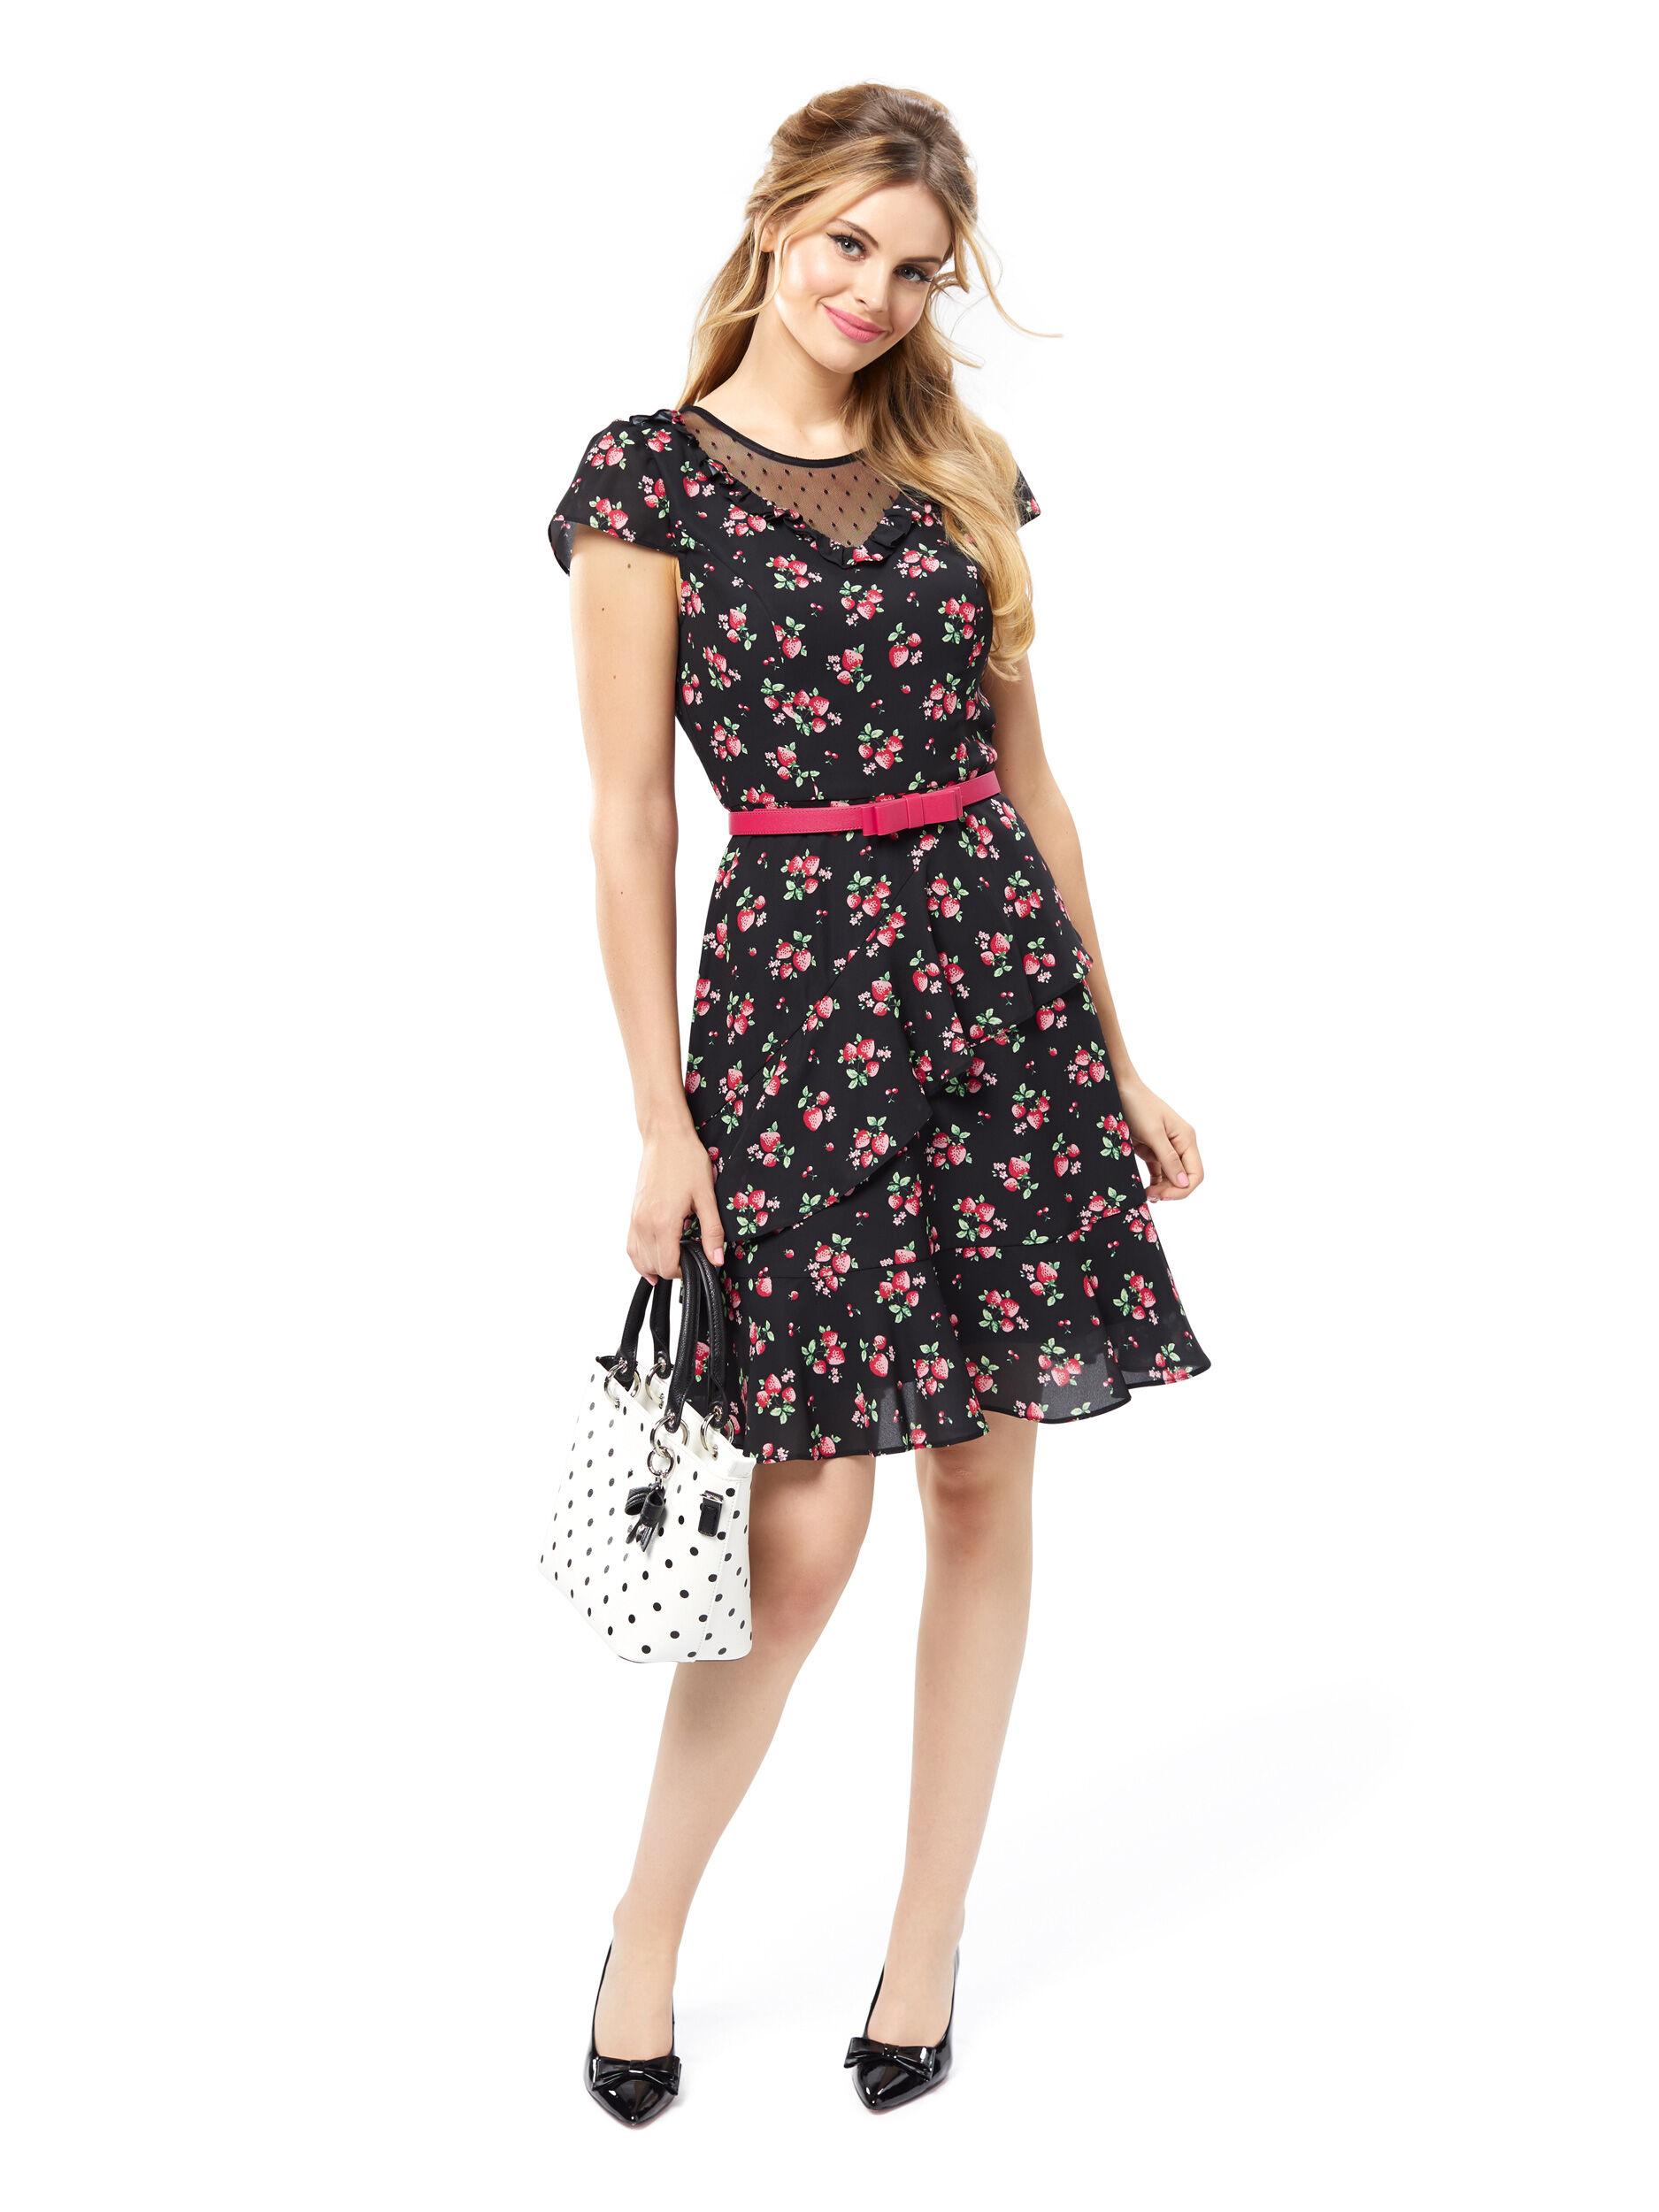 Strawberry Patch Dress